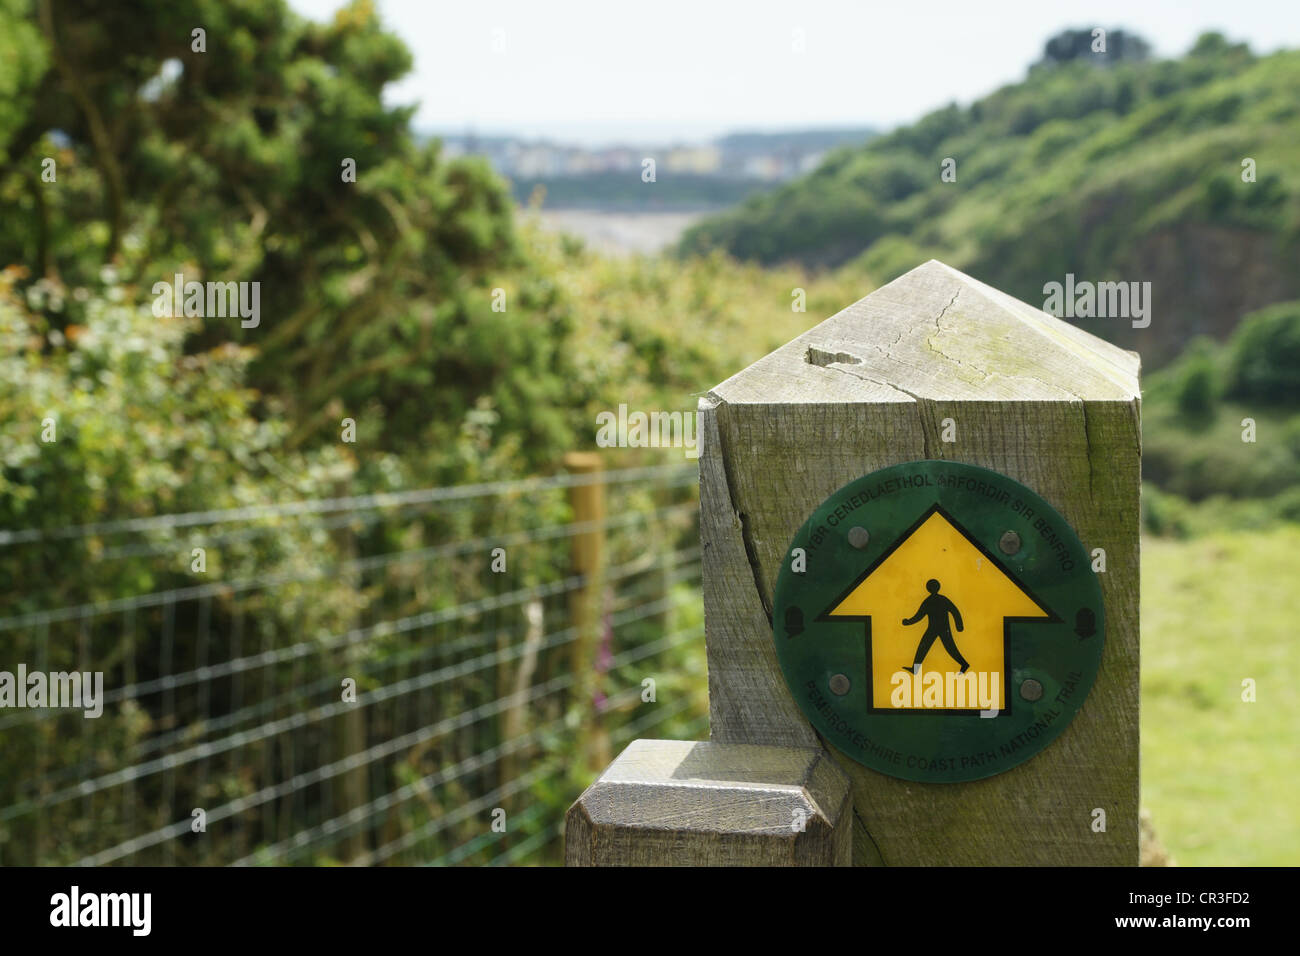 Signpost on the Pembrokeshire Coastal Path - Stock Image